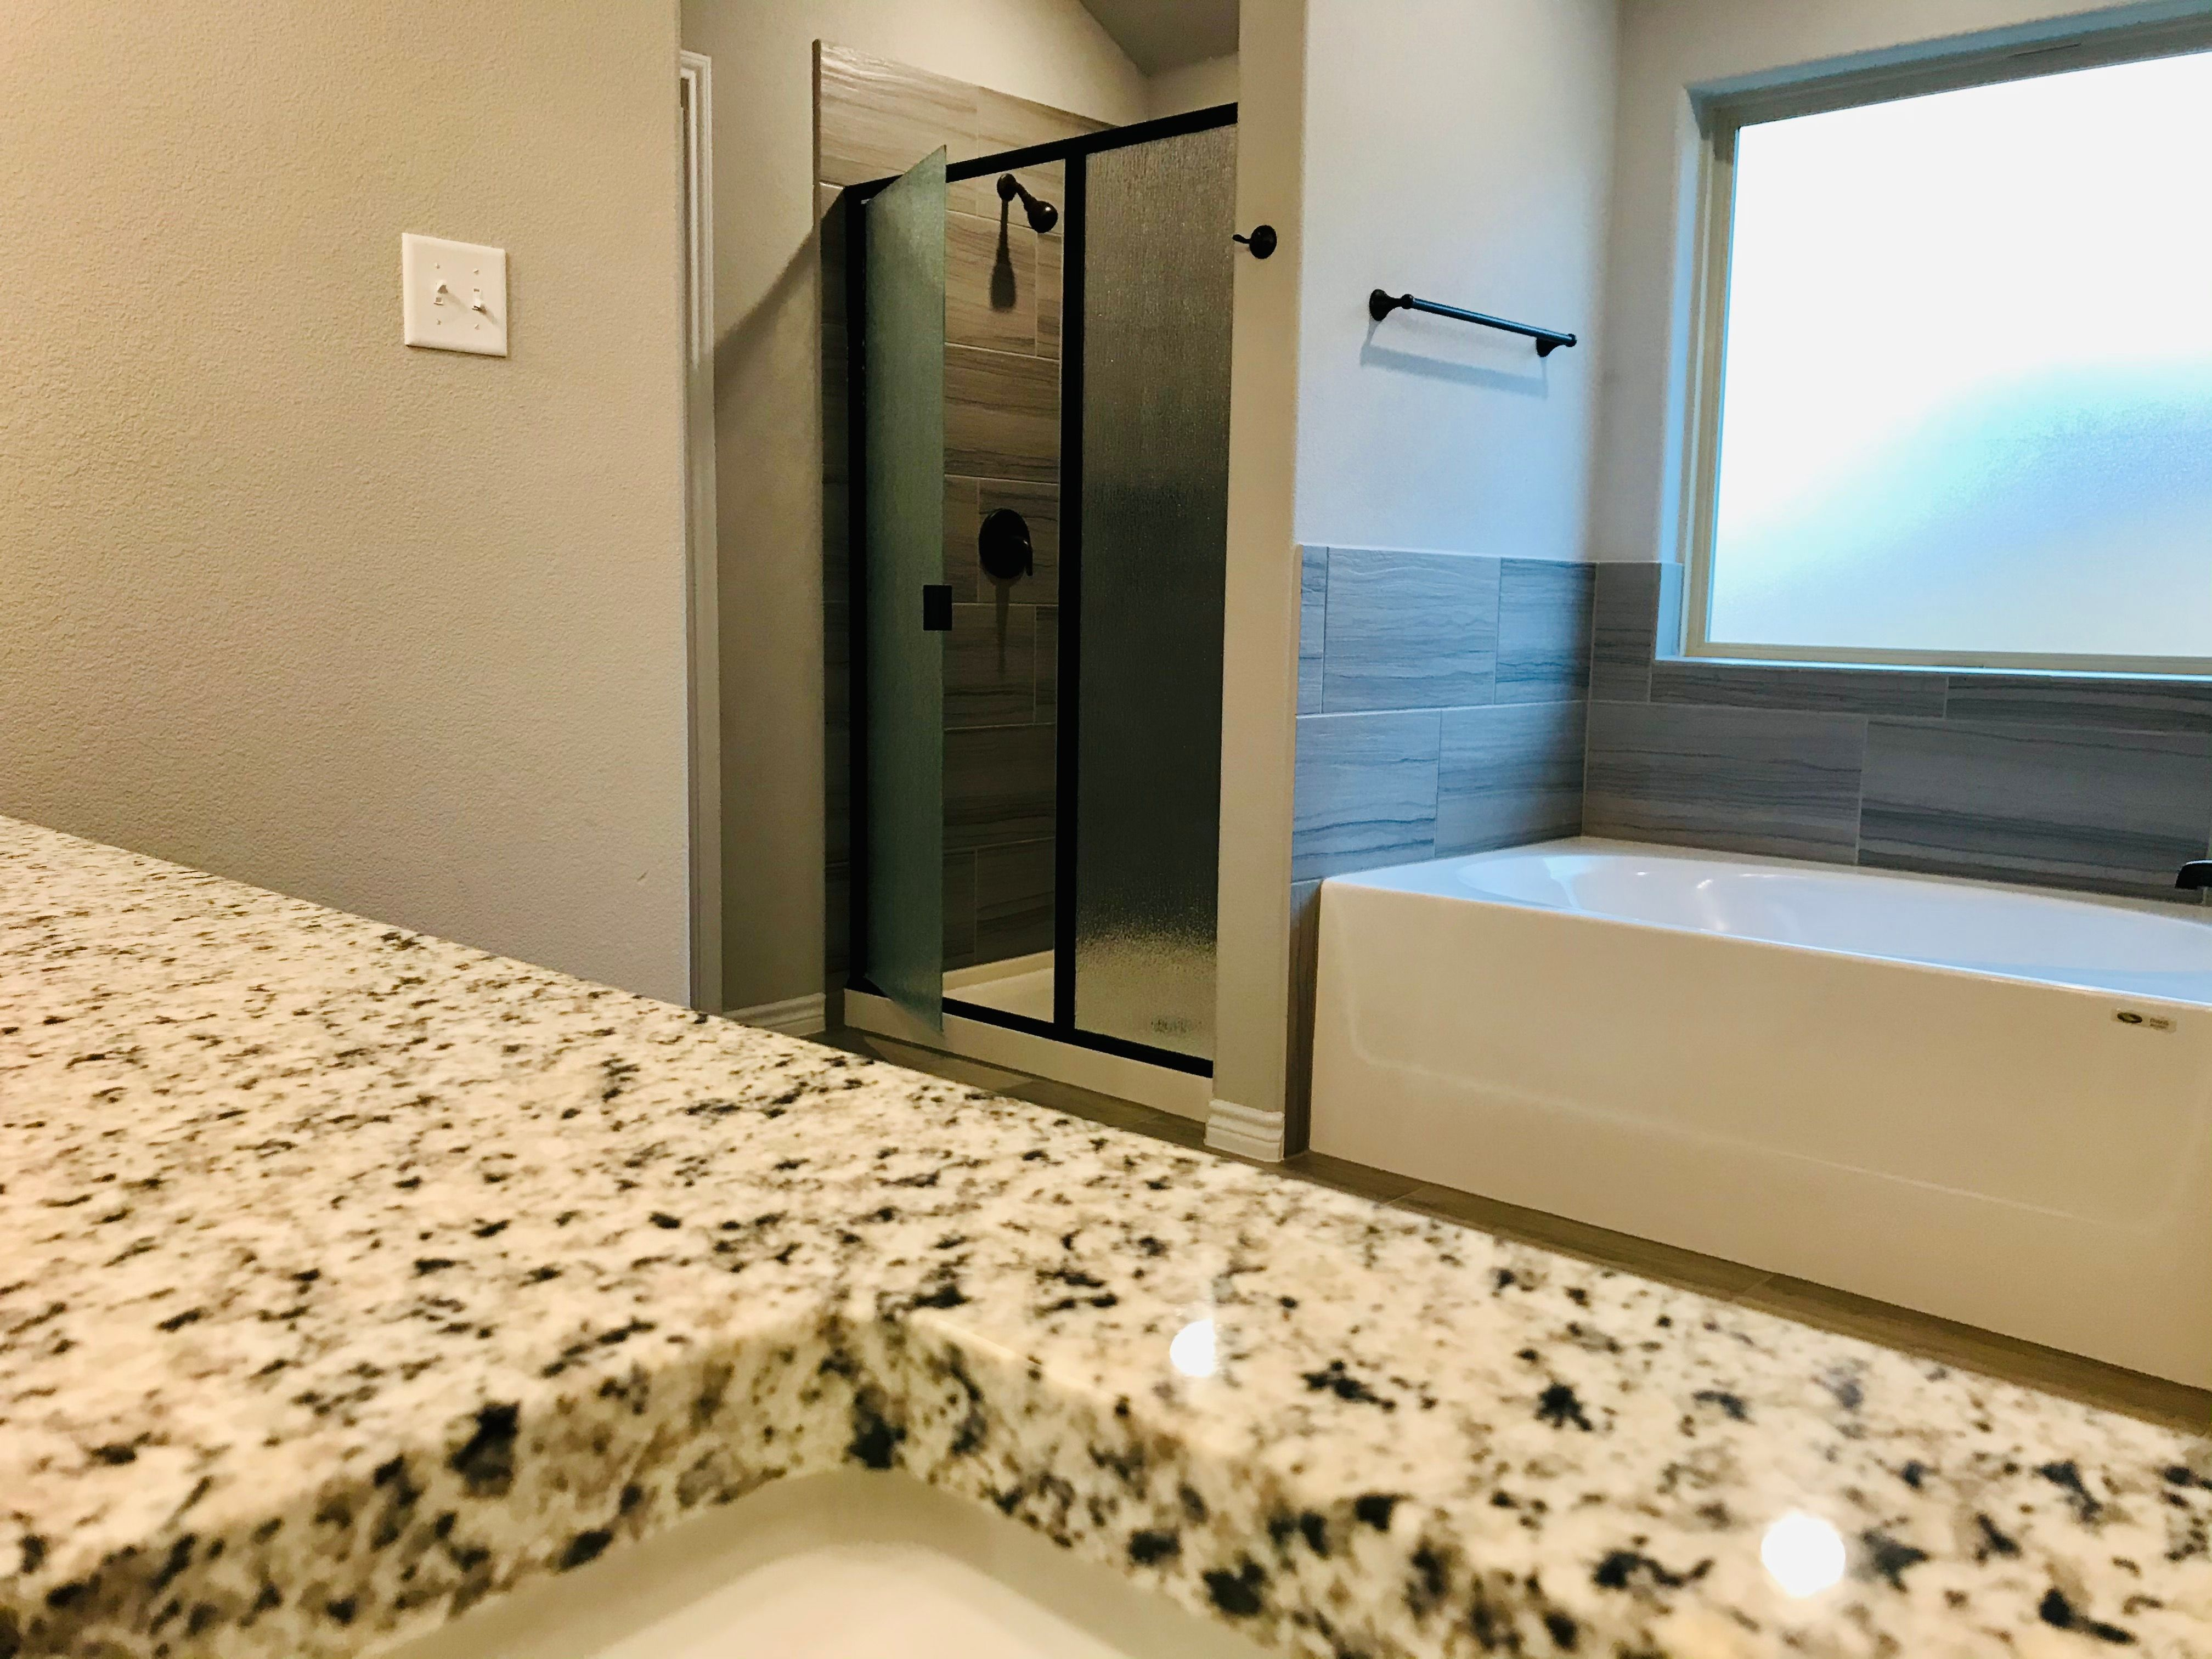 Bathroom featured in the San Bernard River By Ashford Homes in Killeen, TX